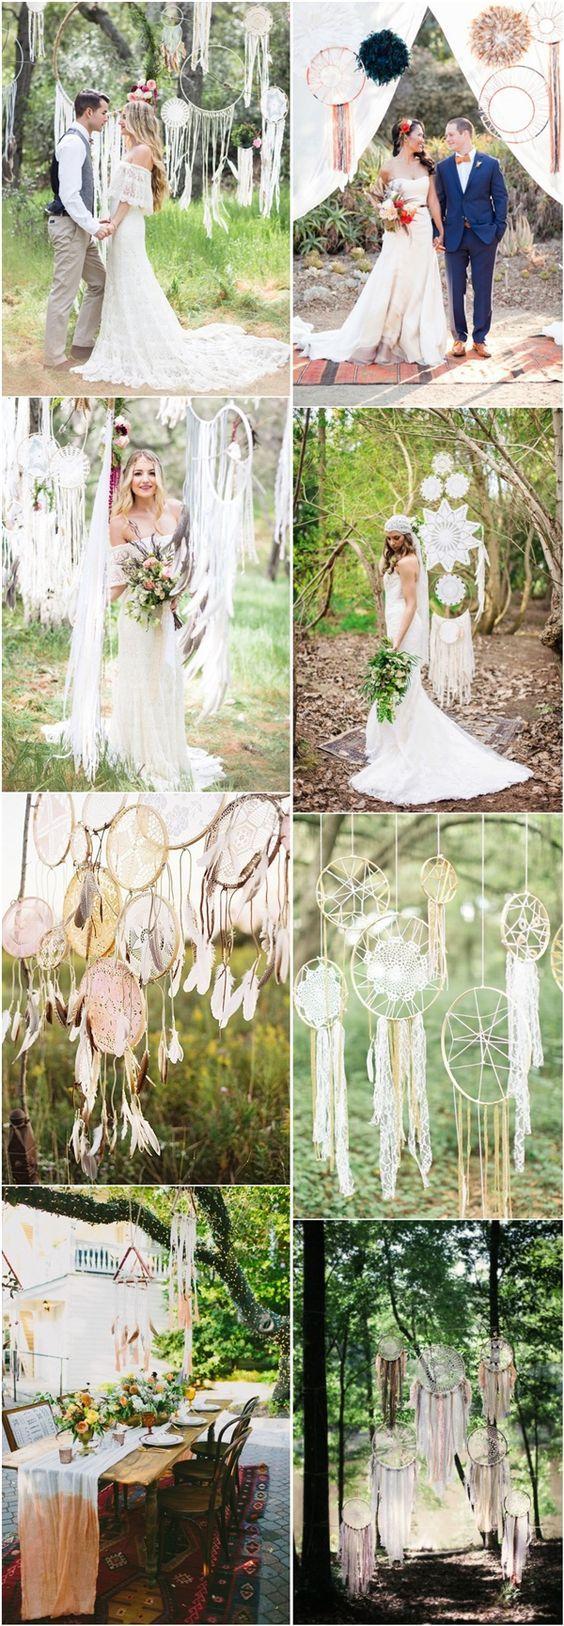 30 dreamcatchers boho wedding decor ideas pinterest